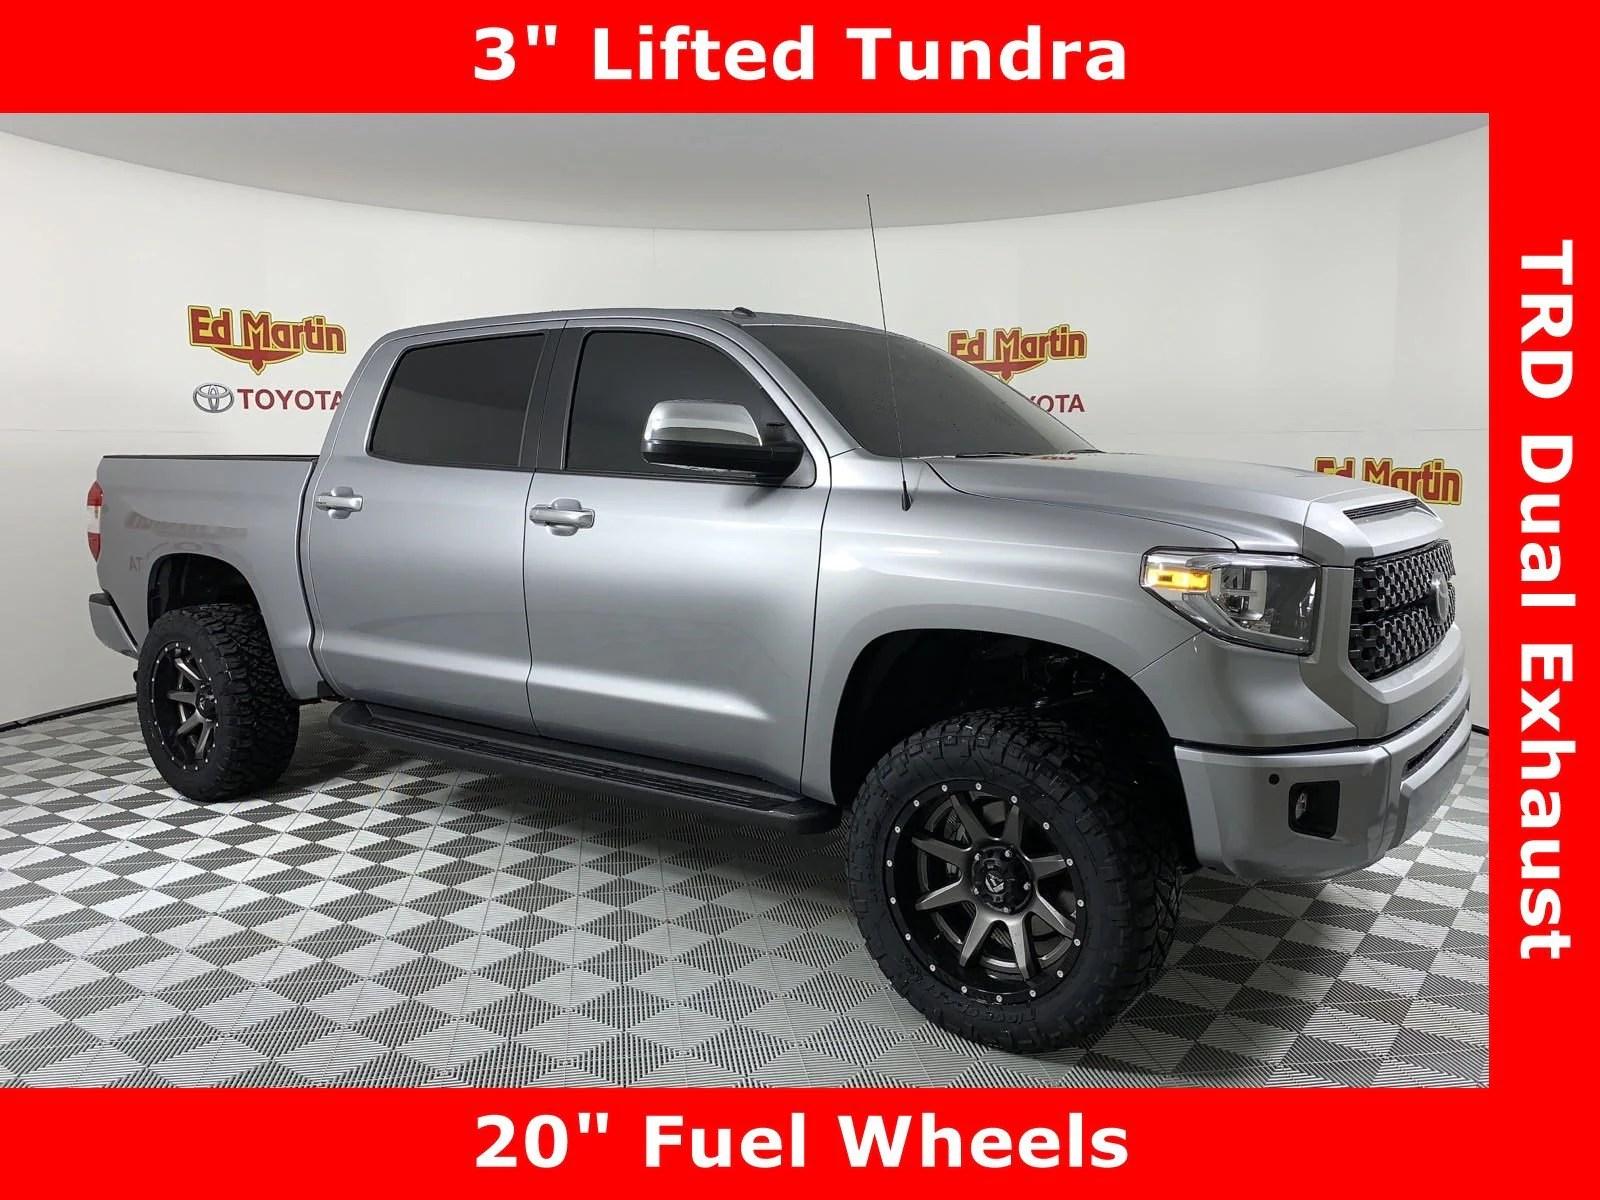 toyota yaris trd rear sway bar berat grand new veloz 2019 tundra for sale noblesville in 5tfay5f19kx798857 platinum 5 7l v8 truck crewmax